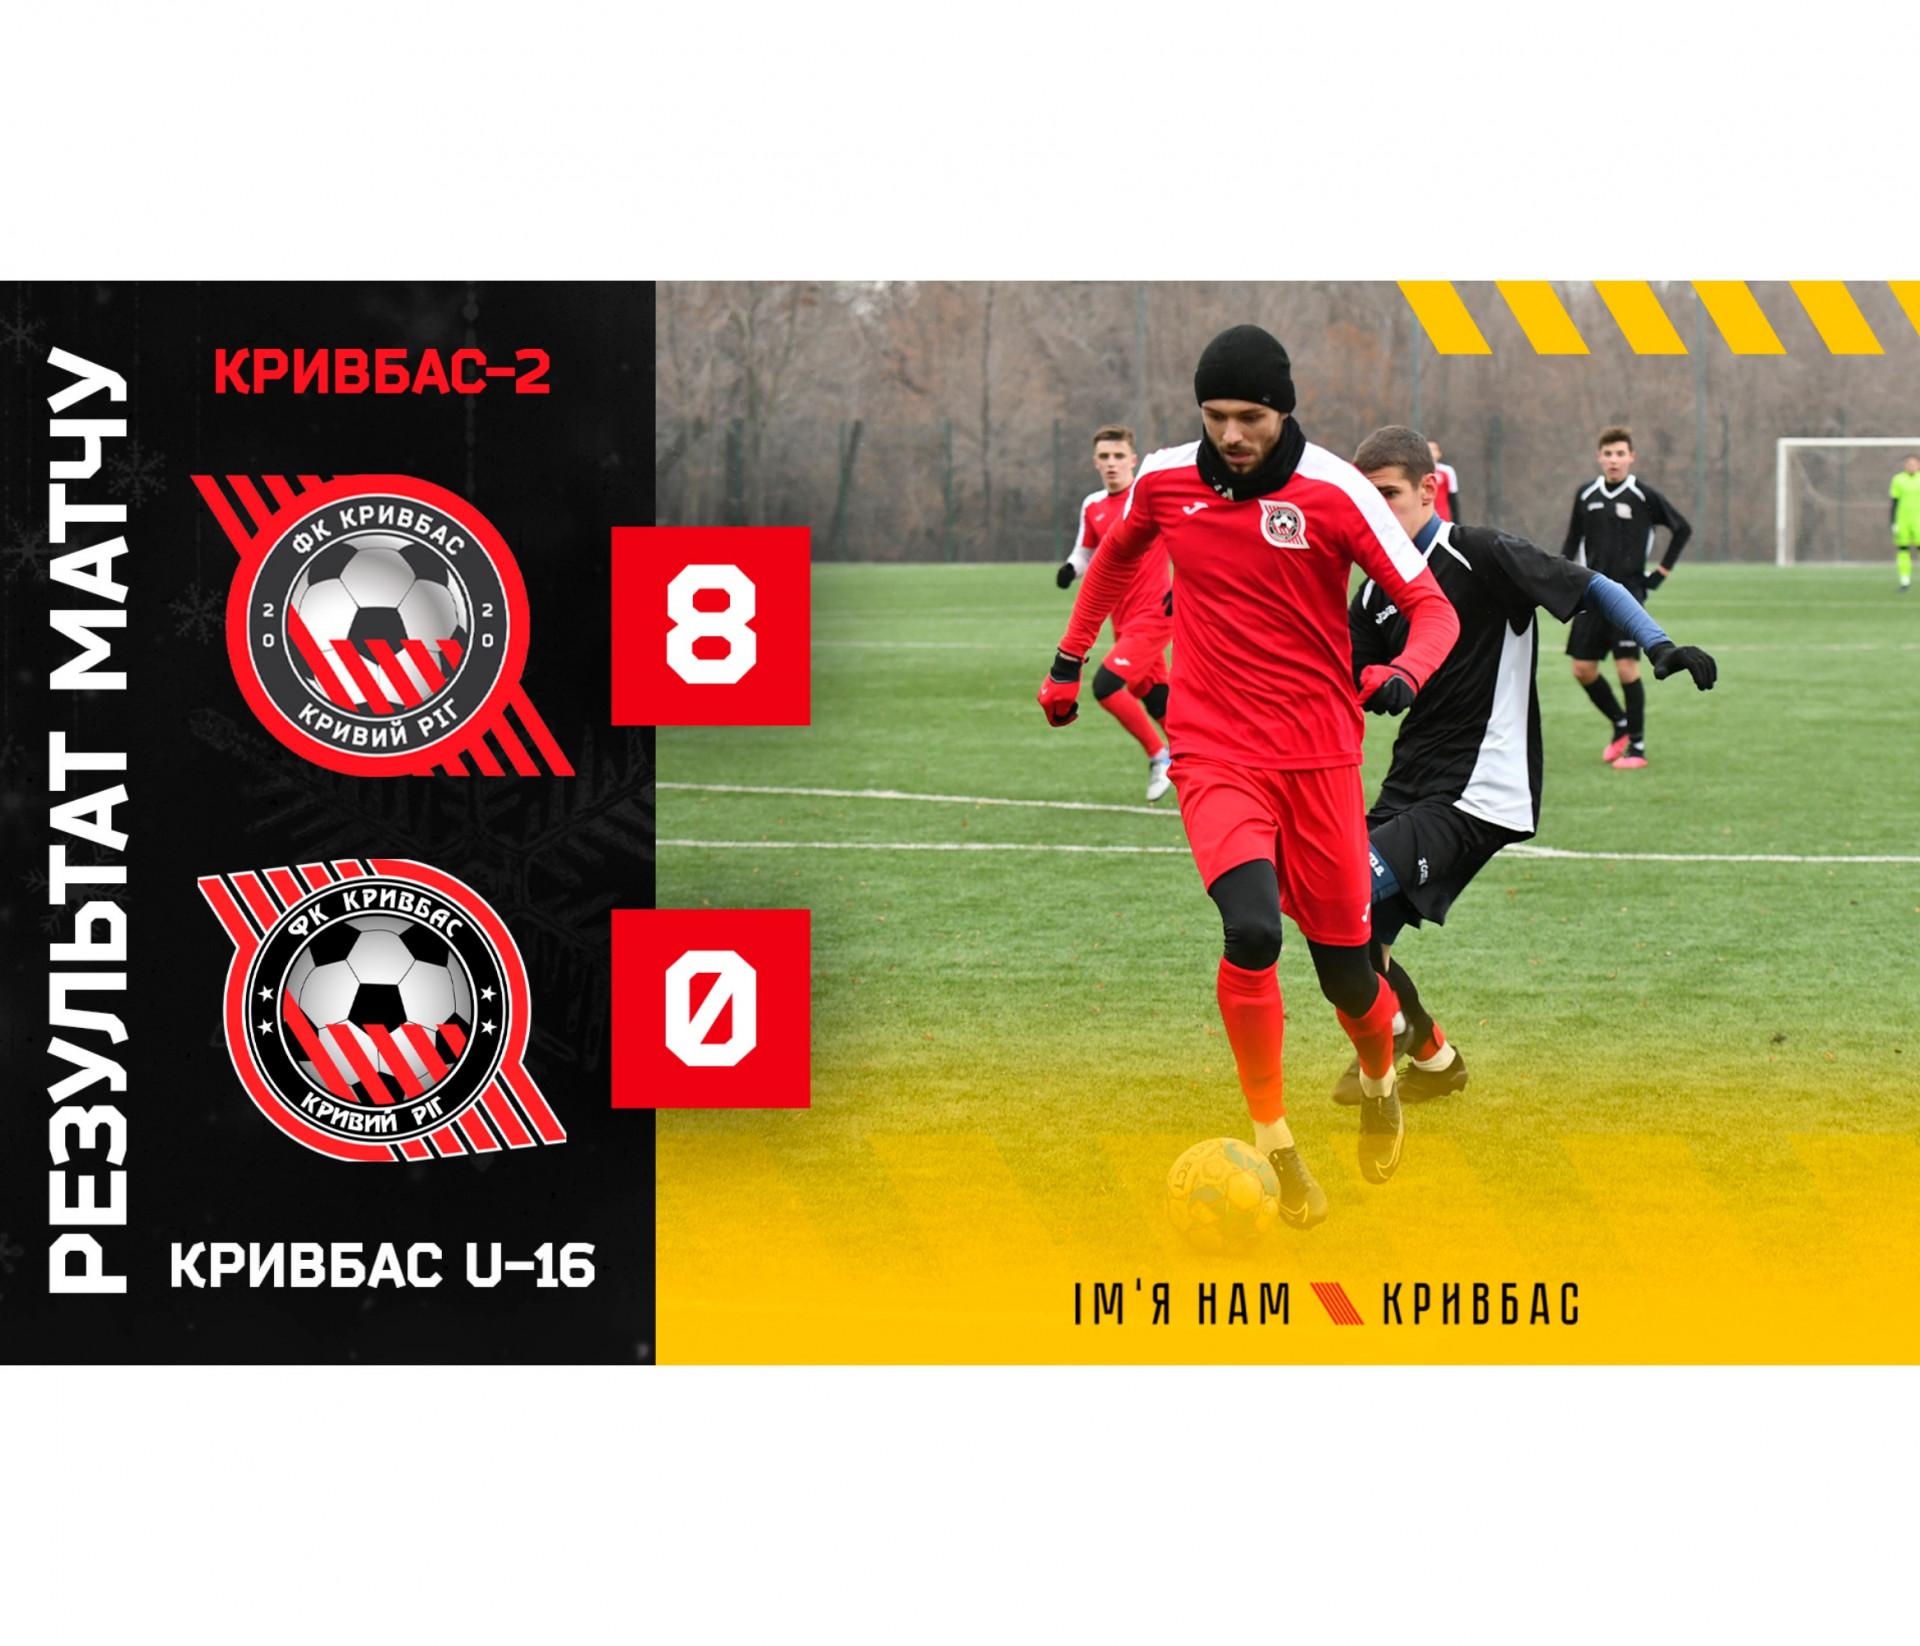 """Кривбас-2"" - ДЮСШ-1 ""Кривбас-84"" U-16 8:0}"